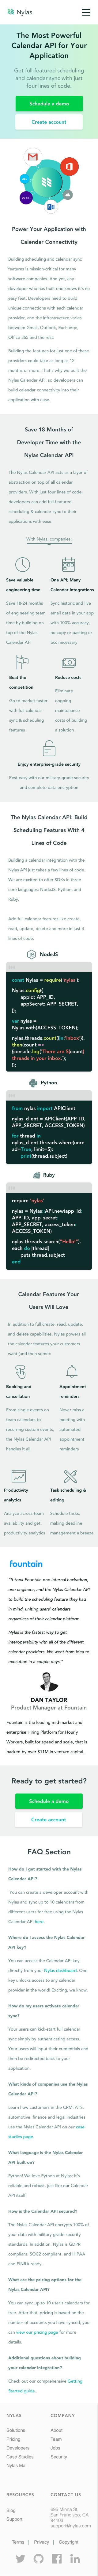 Nylas Calendar API - Mobile.png